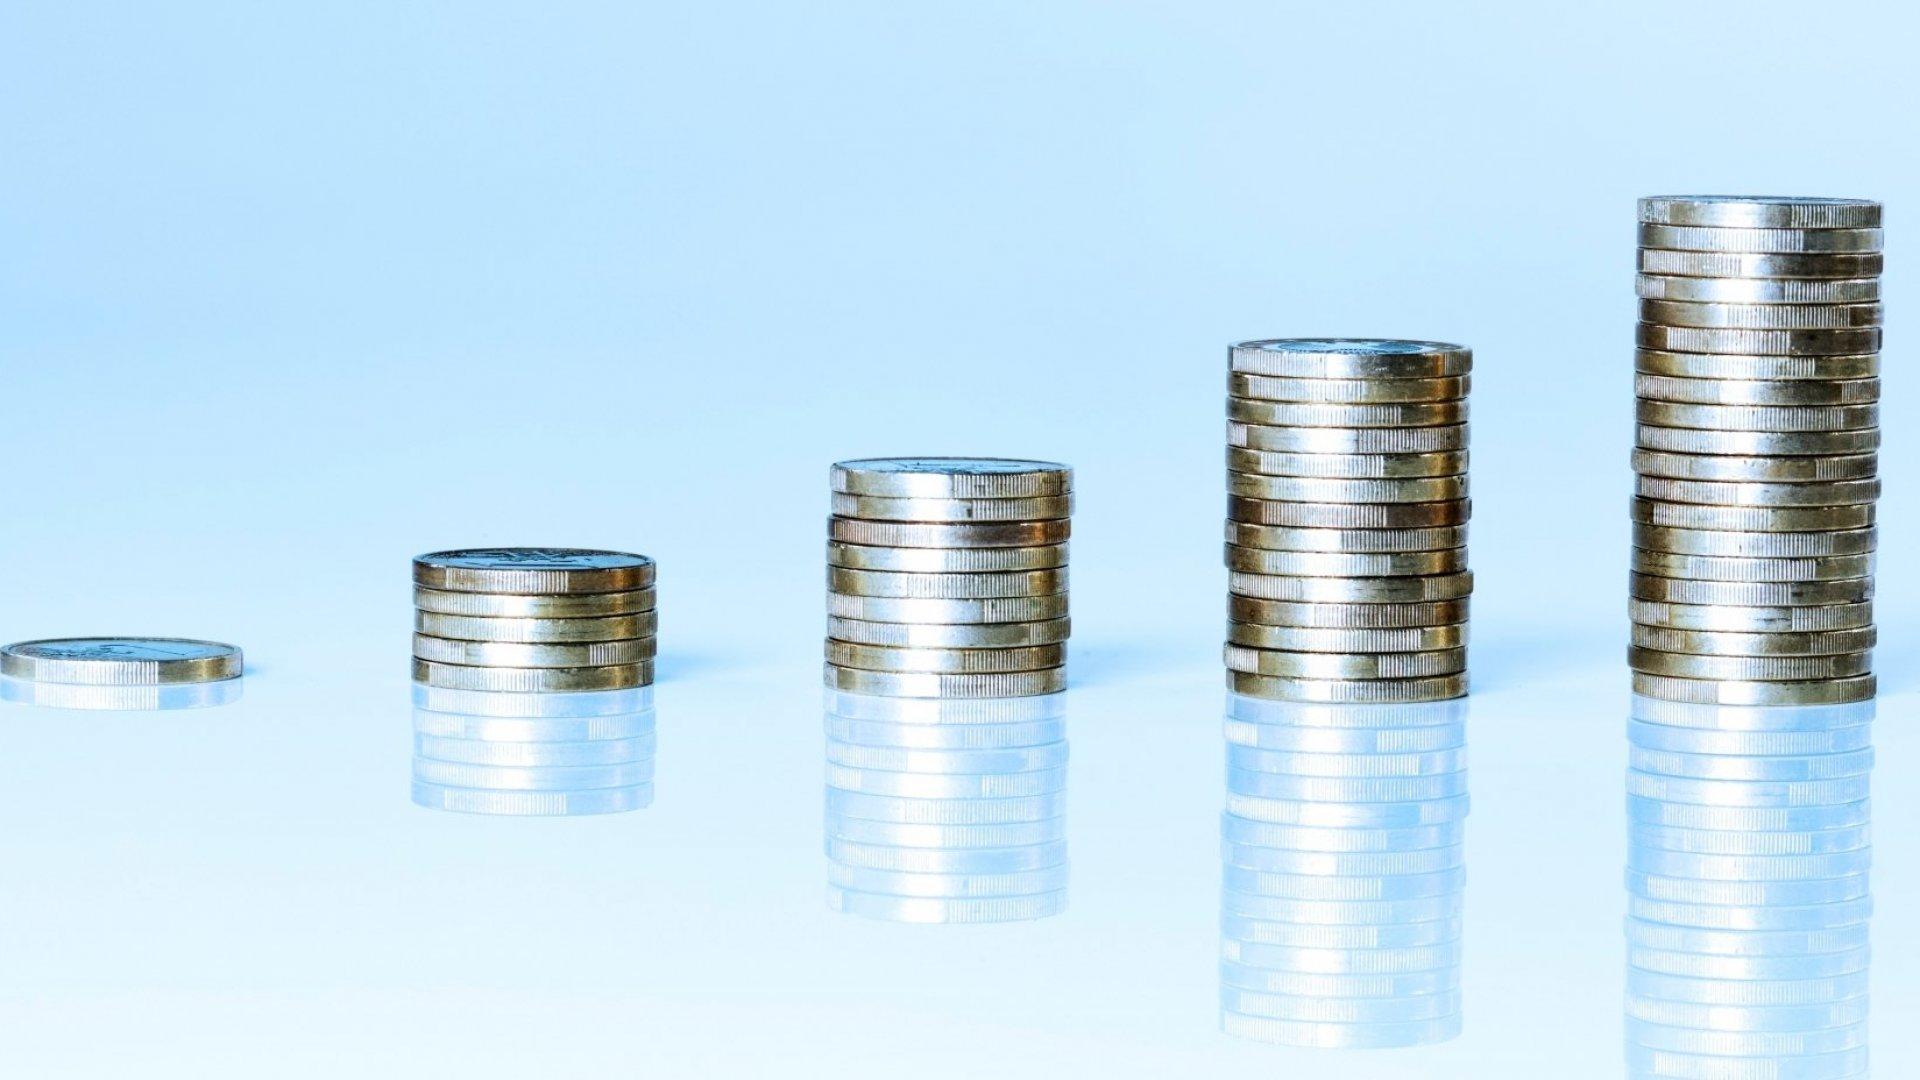 3 Growth Strategies That Propelled This $1.4 Billion Serial Entrepreneur